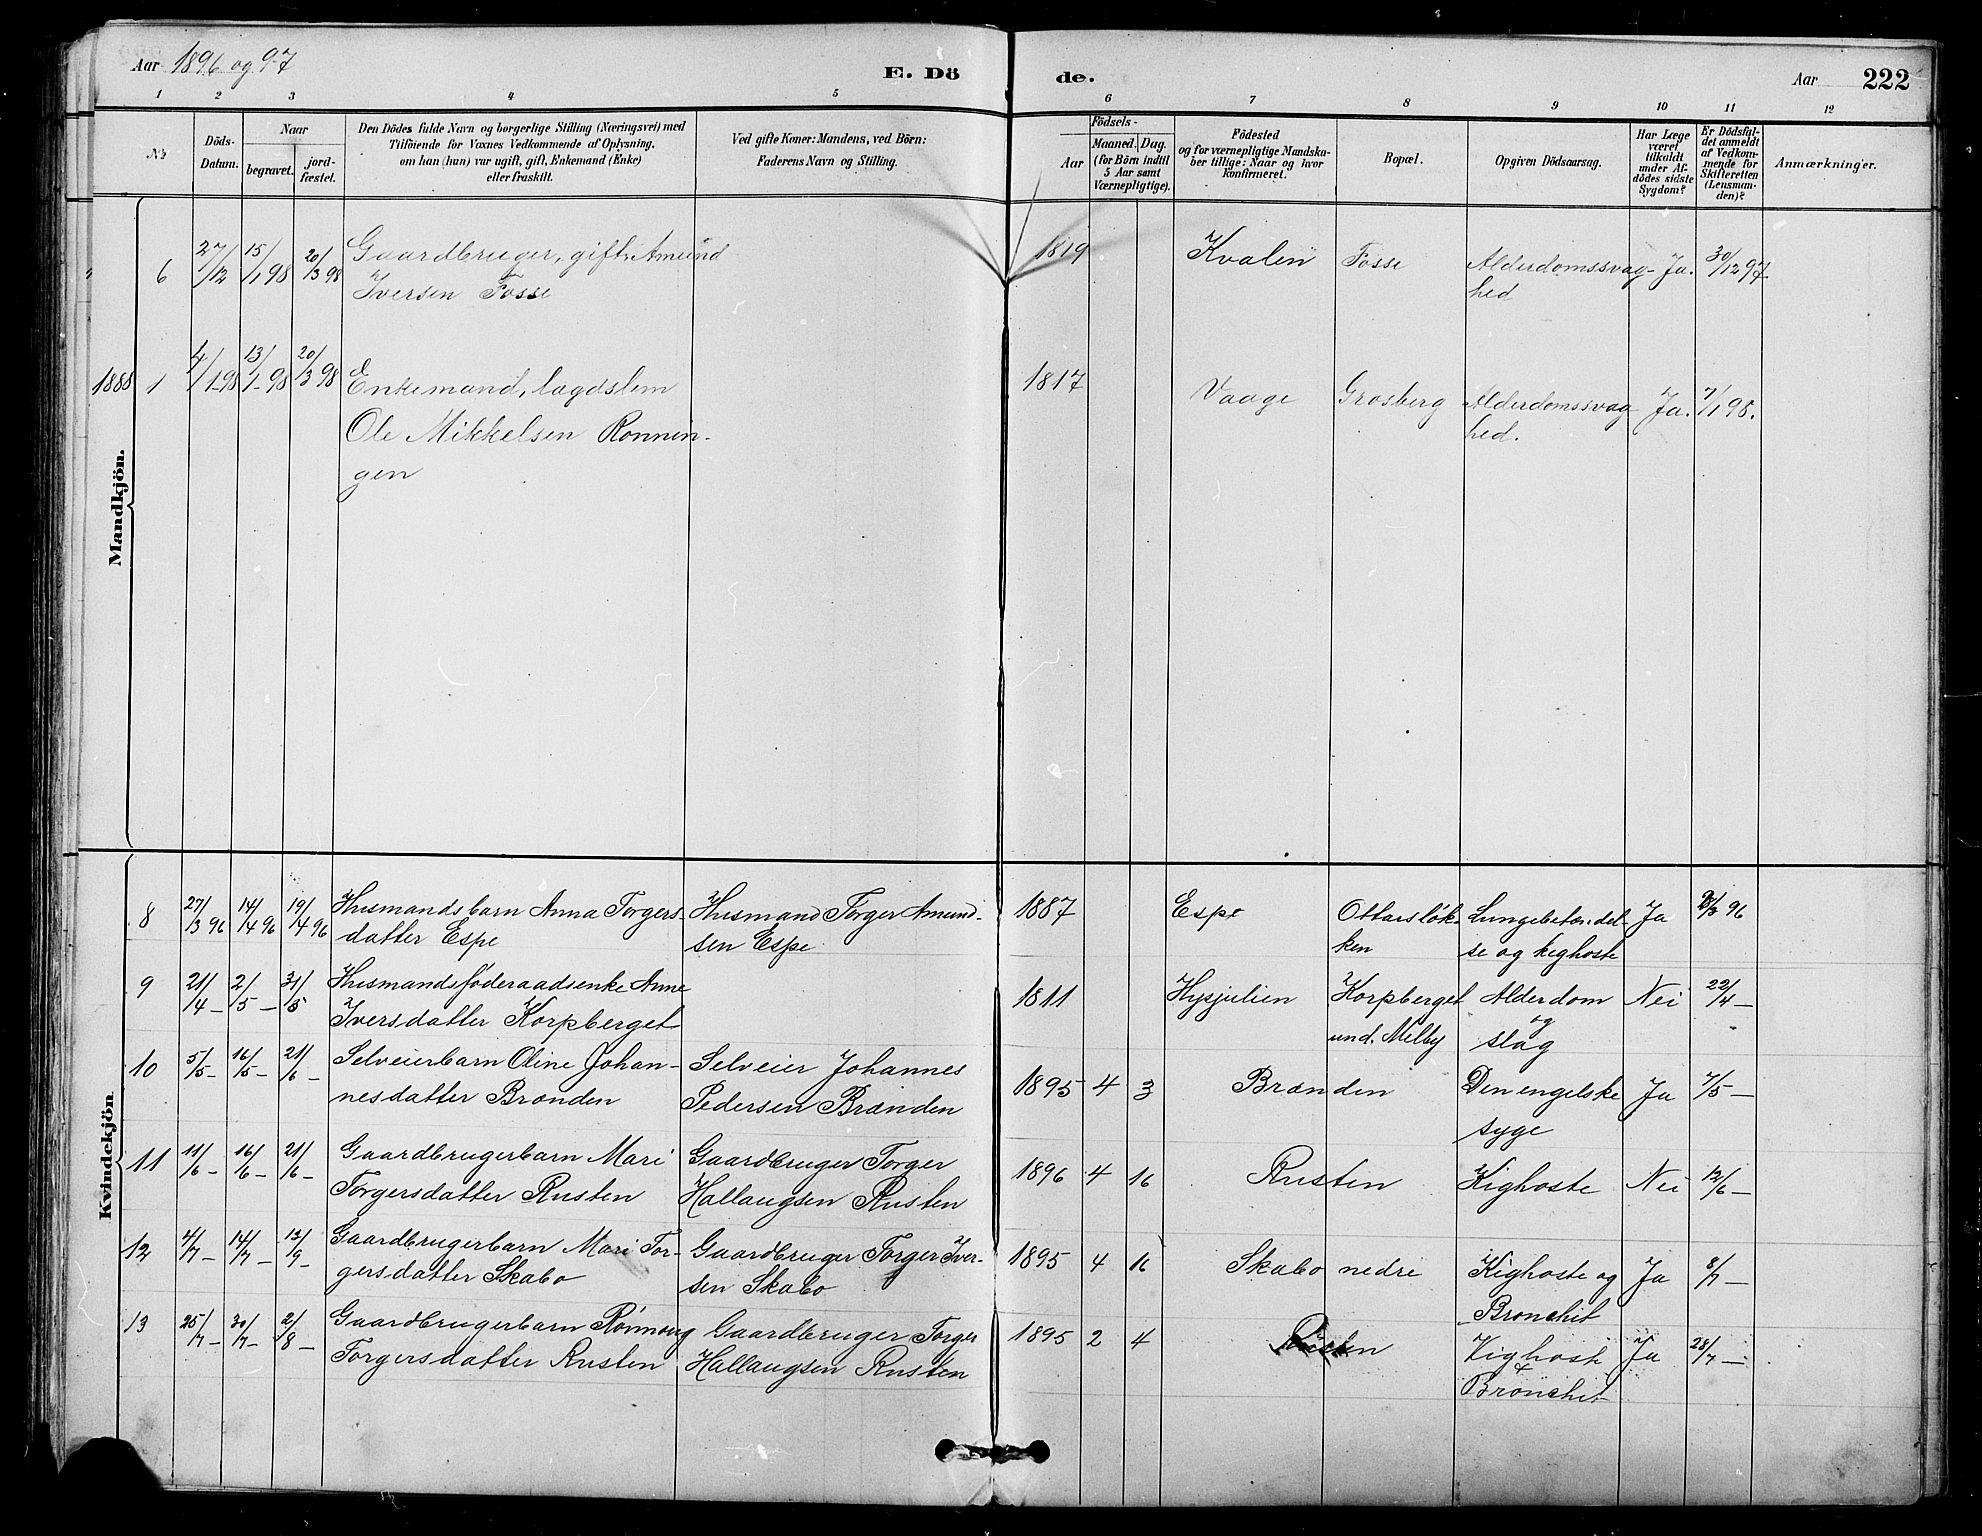 SAH, Nord-Fron prestekontor, Klokkerbok nr. 5, 1884-1914, s. 222